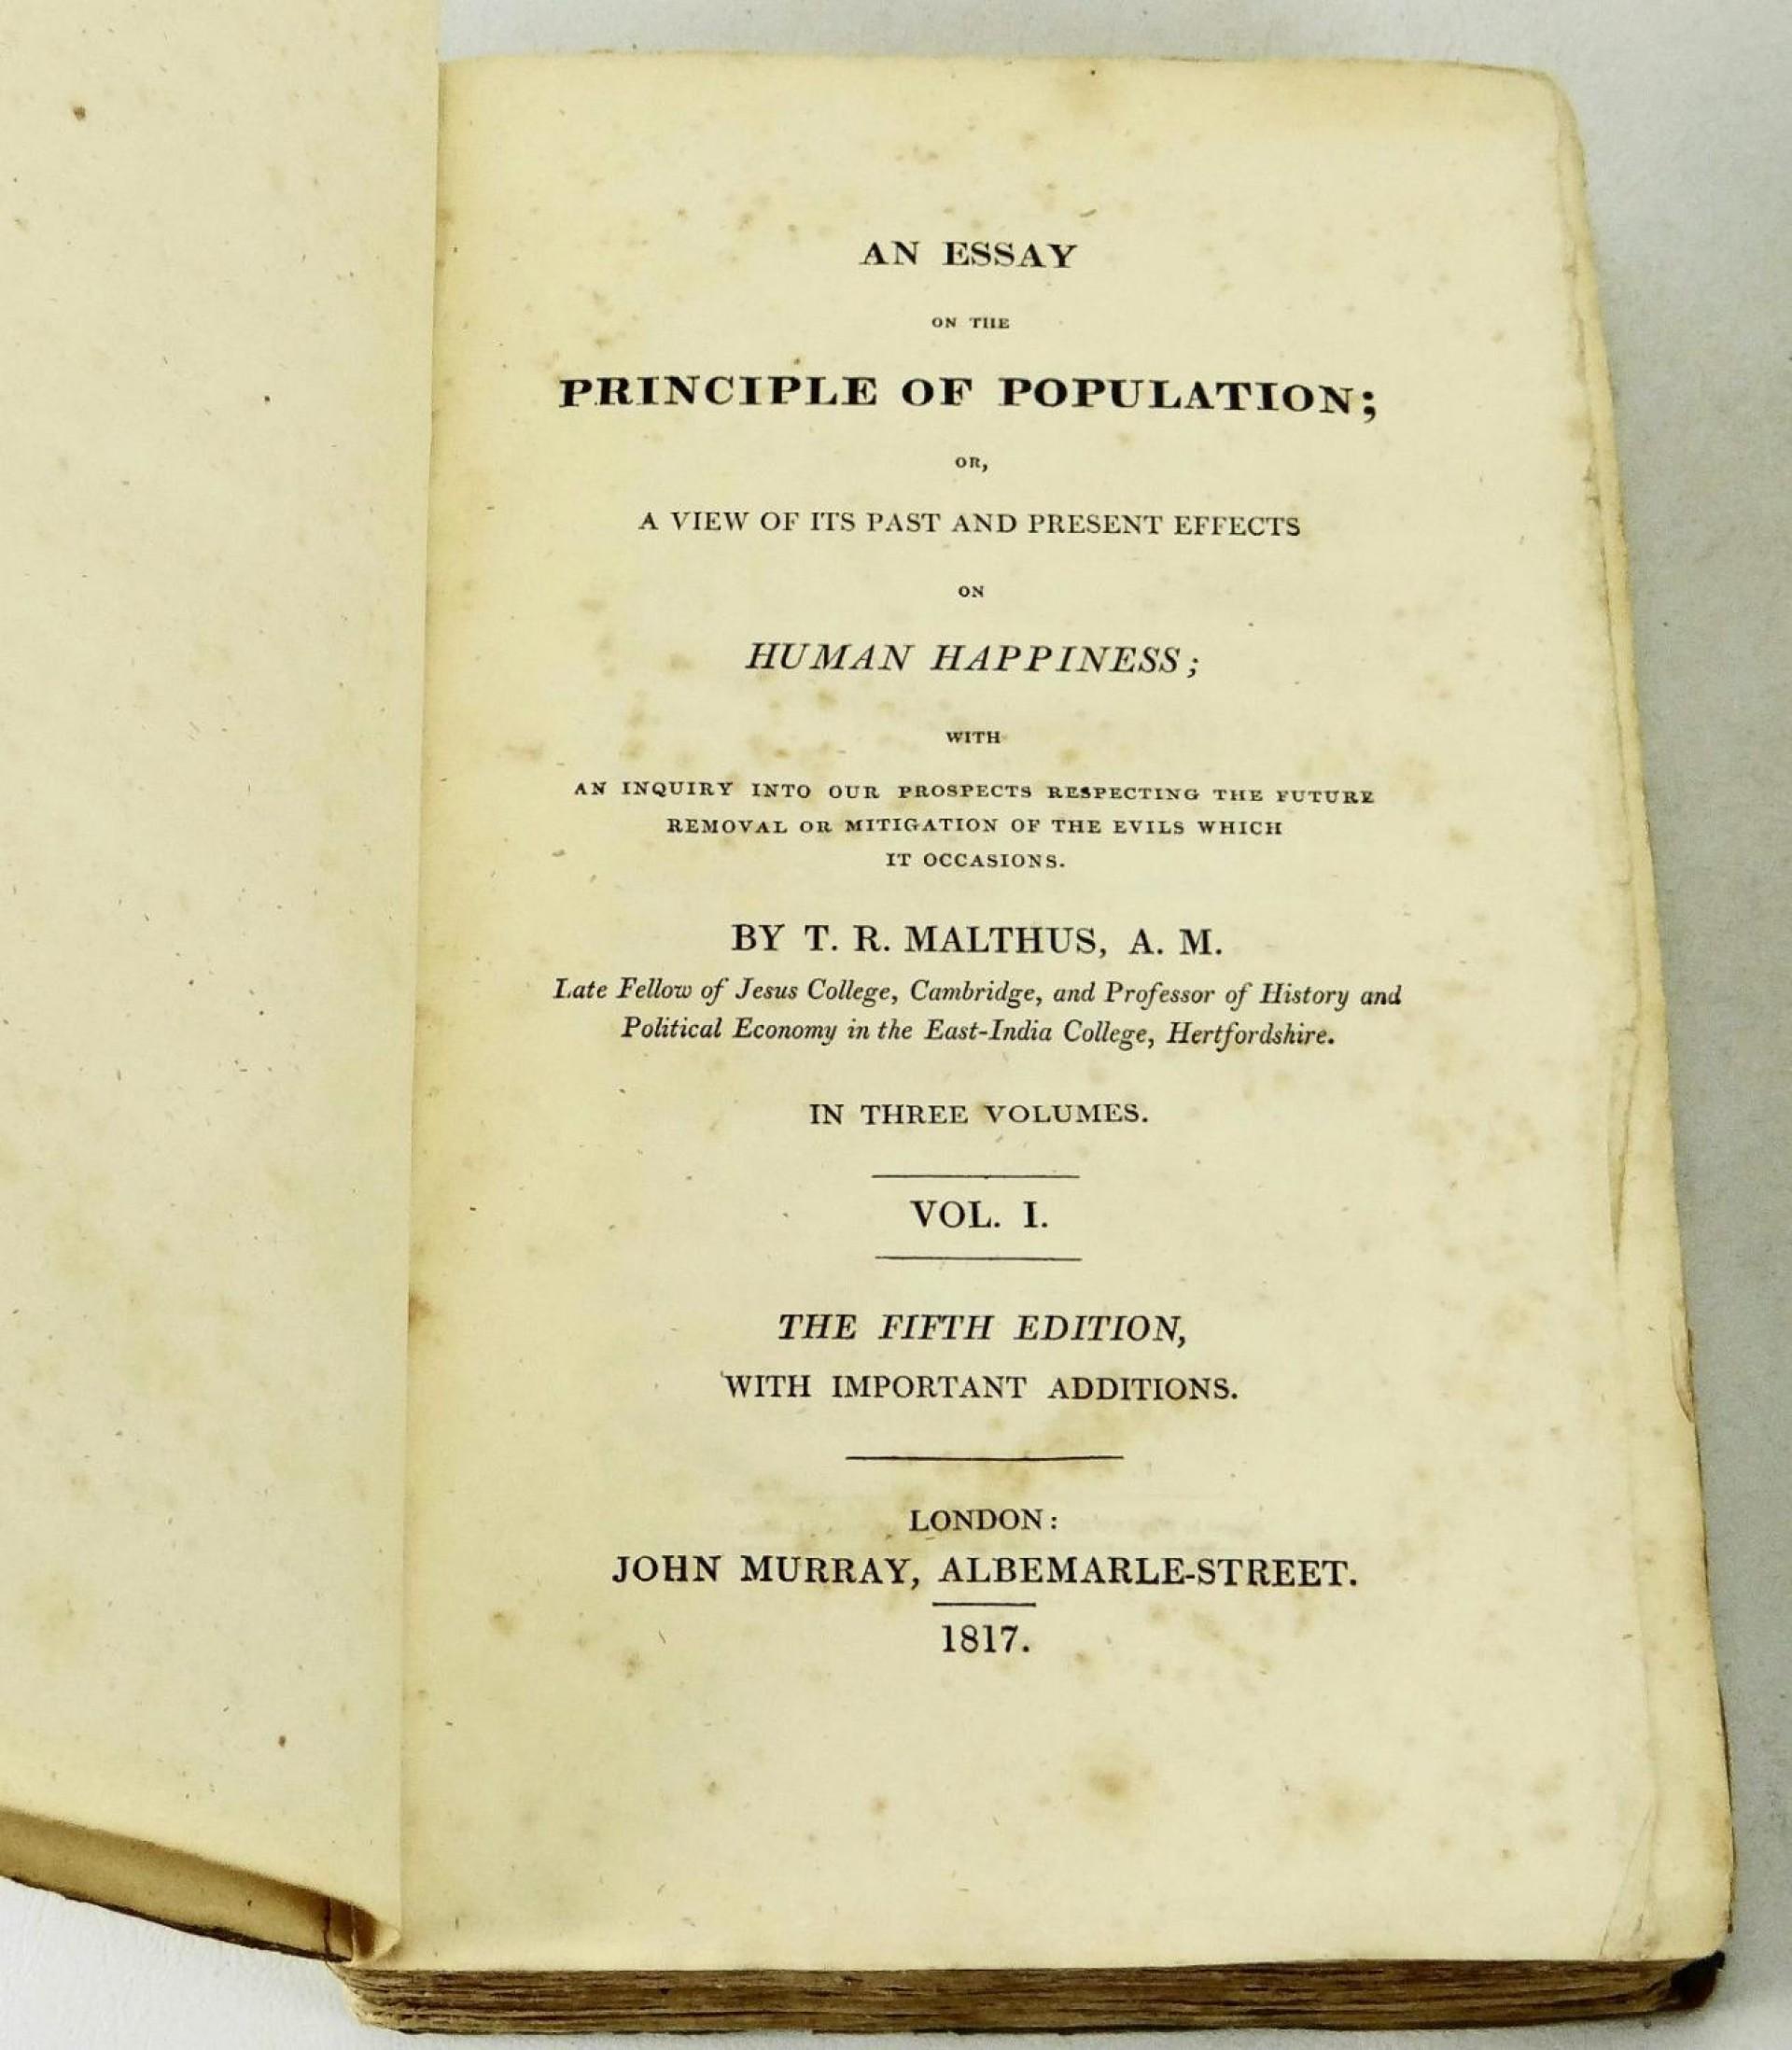 011 13726403944 5 Essay On The Principle Of Population Singular Pdf By Thomas Malthus Main Idea 1920